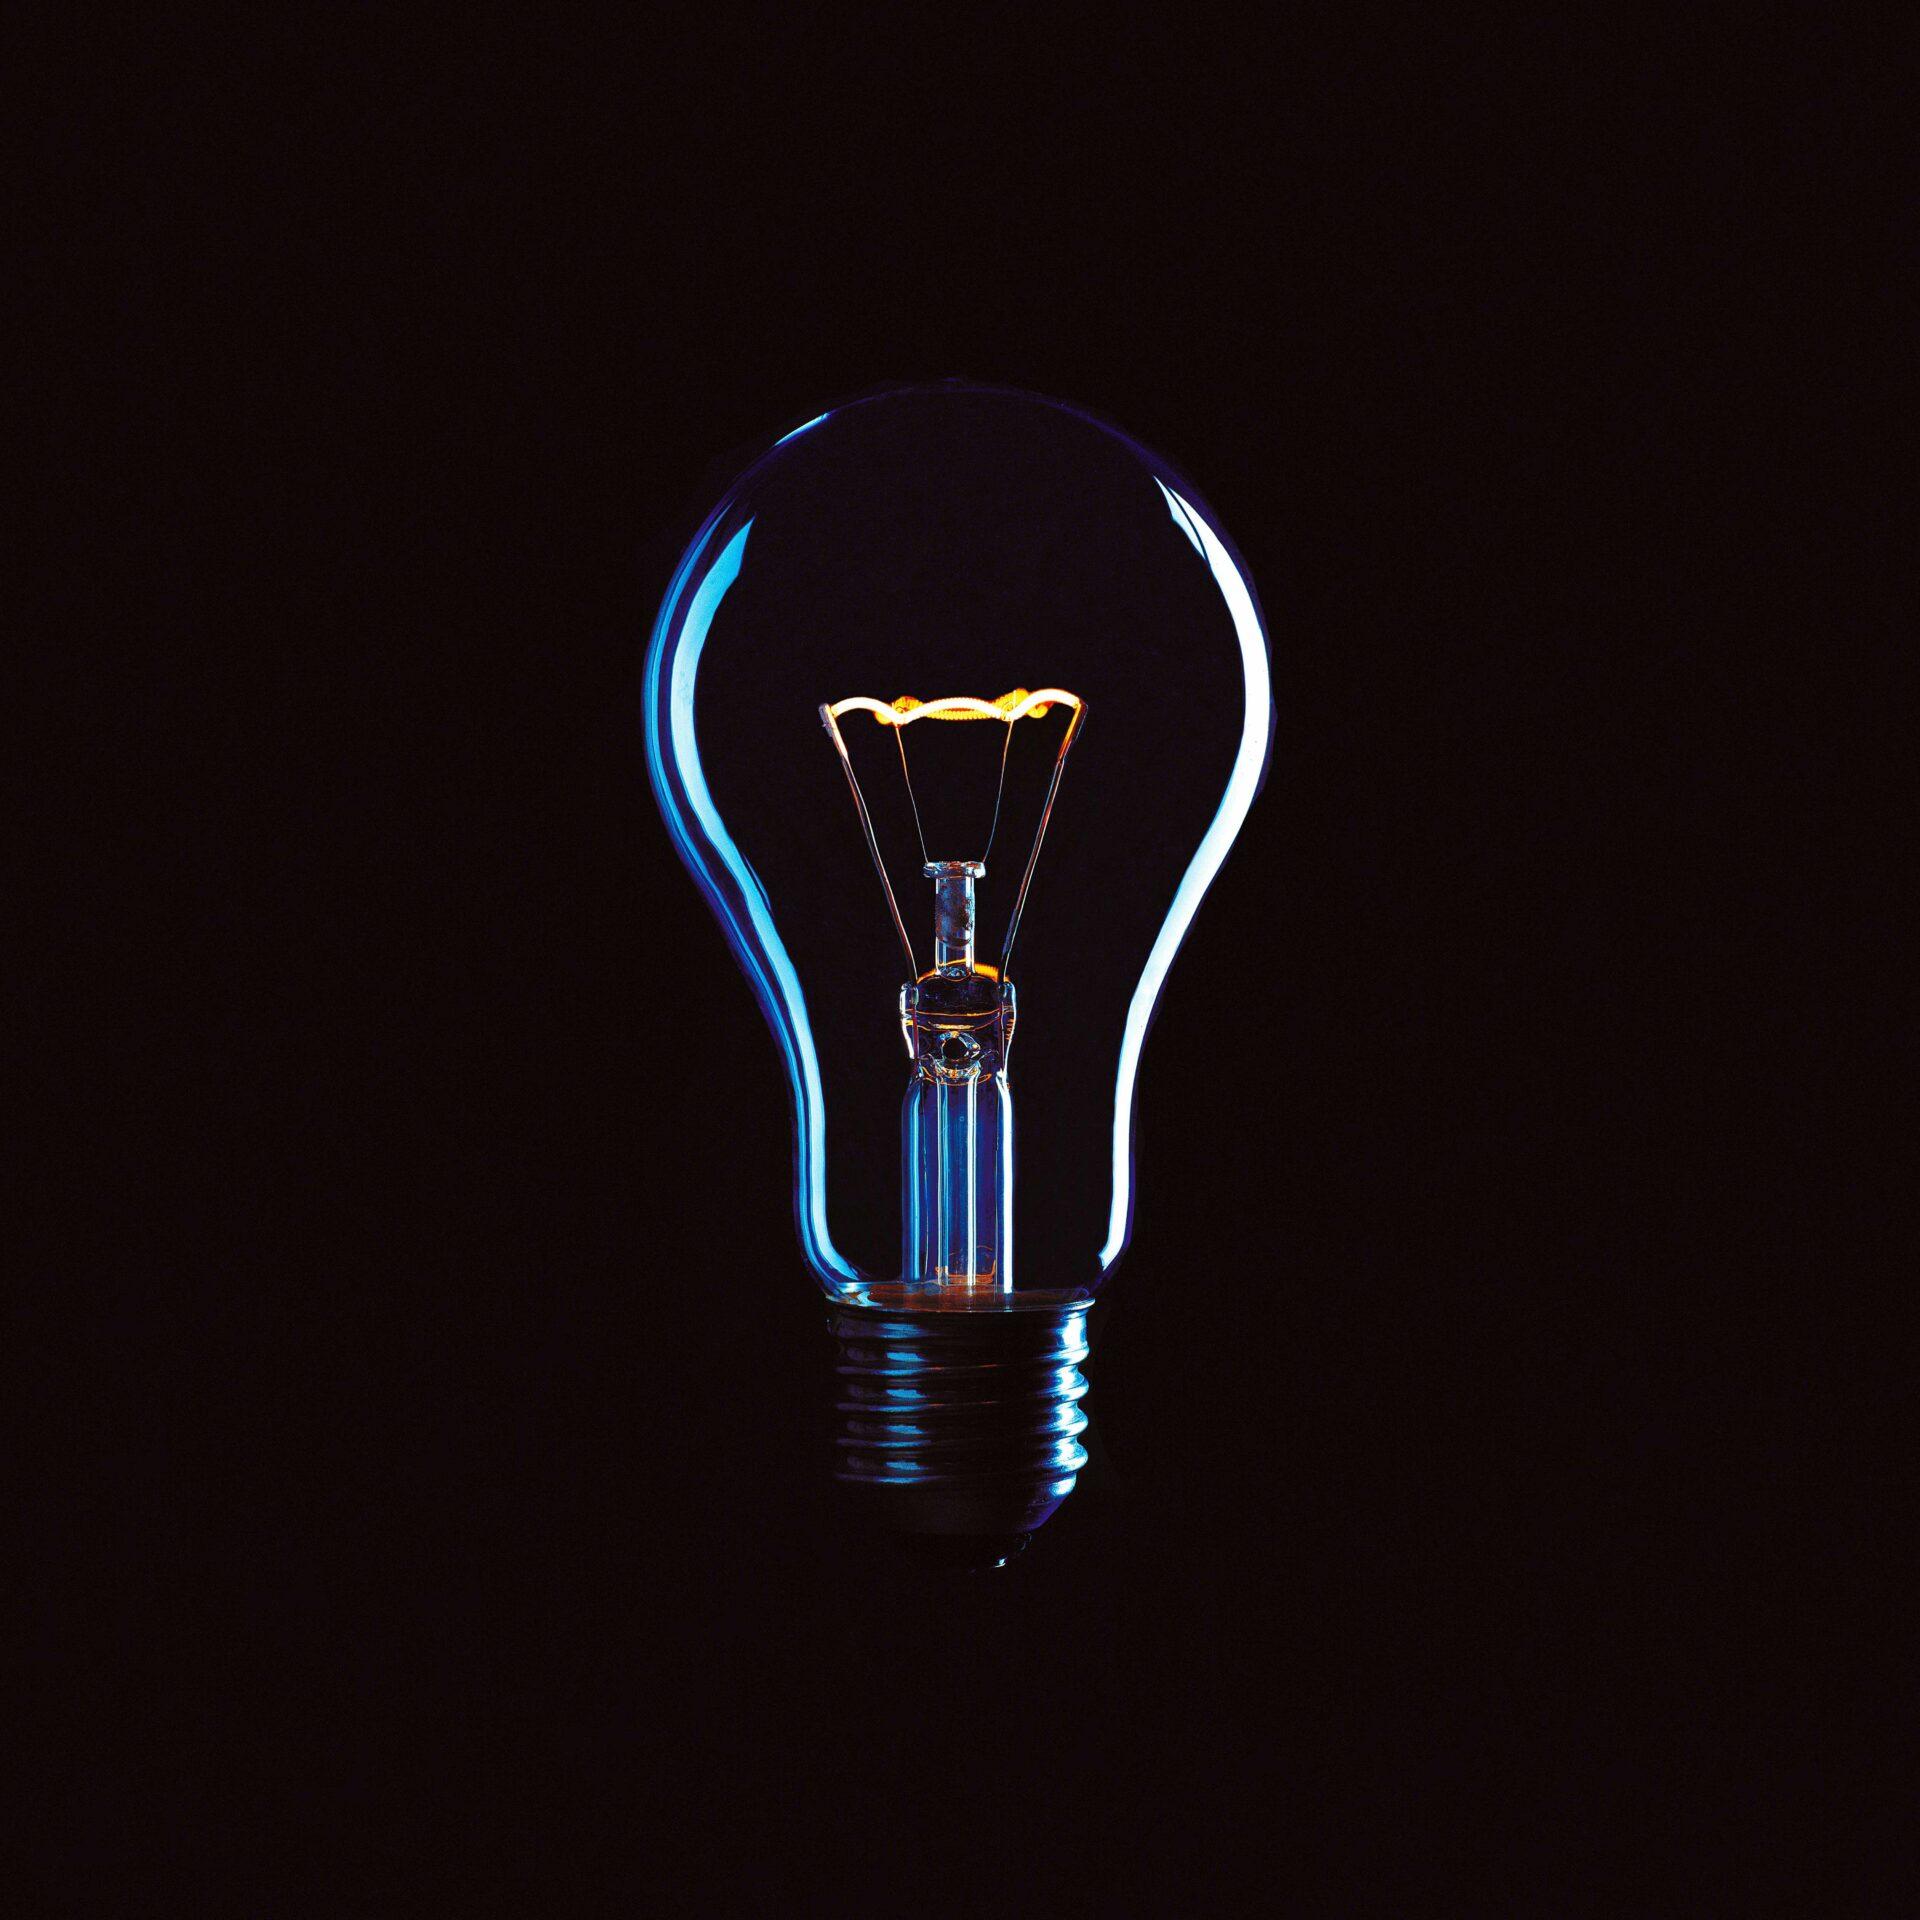 https://www.ccifrance-allemagne.fr/wp-content/uploads/2021/02/ampoule_recherche__developpement-scaled.jpg